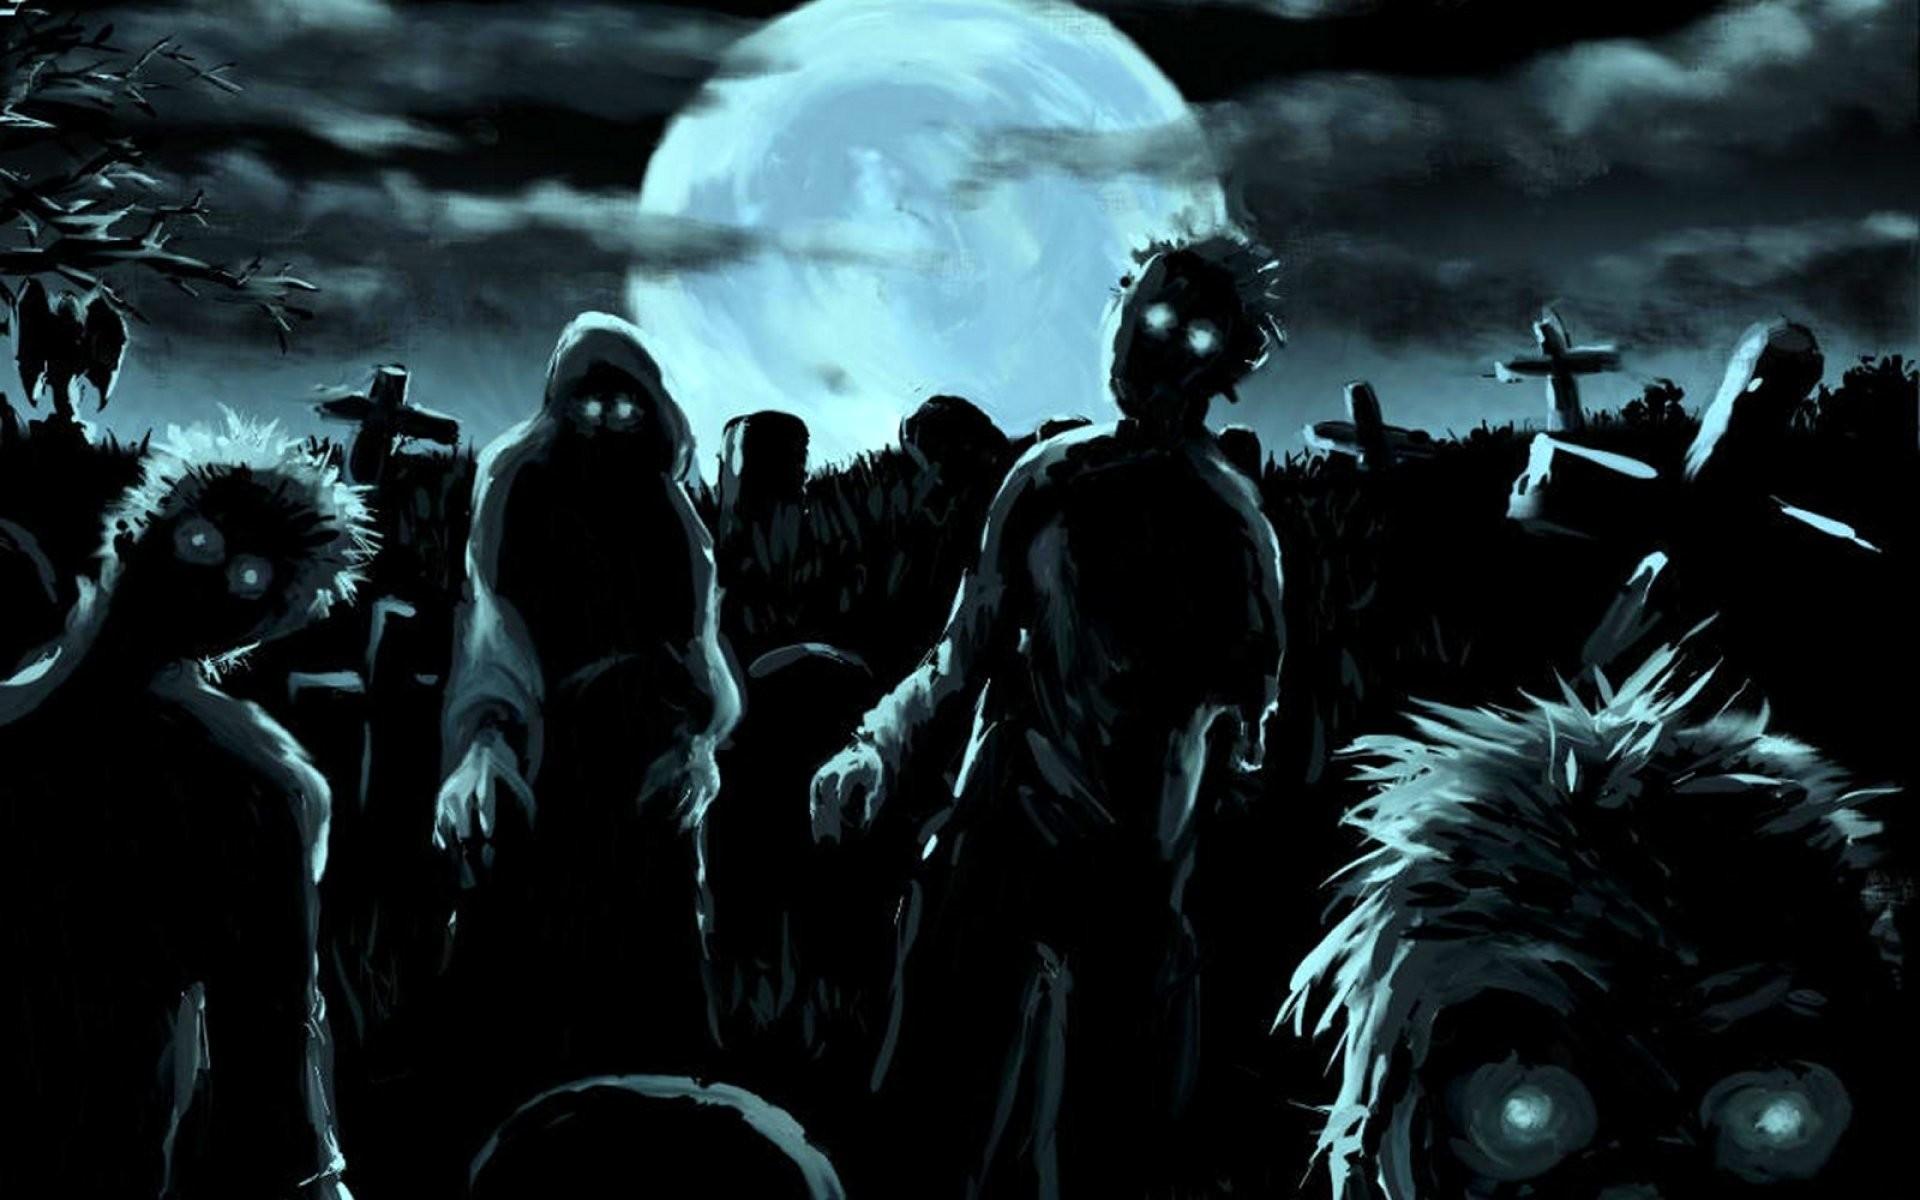 Creepy halloween wallpaper - Dark horror creepy wallpapers ...